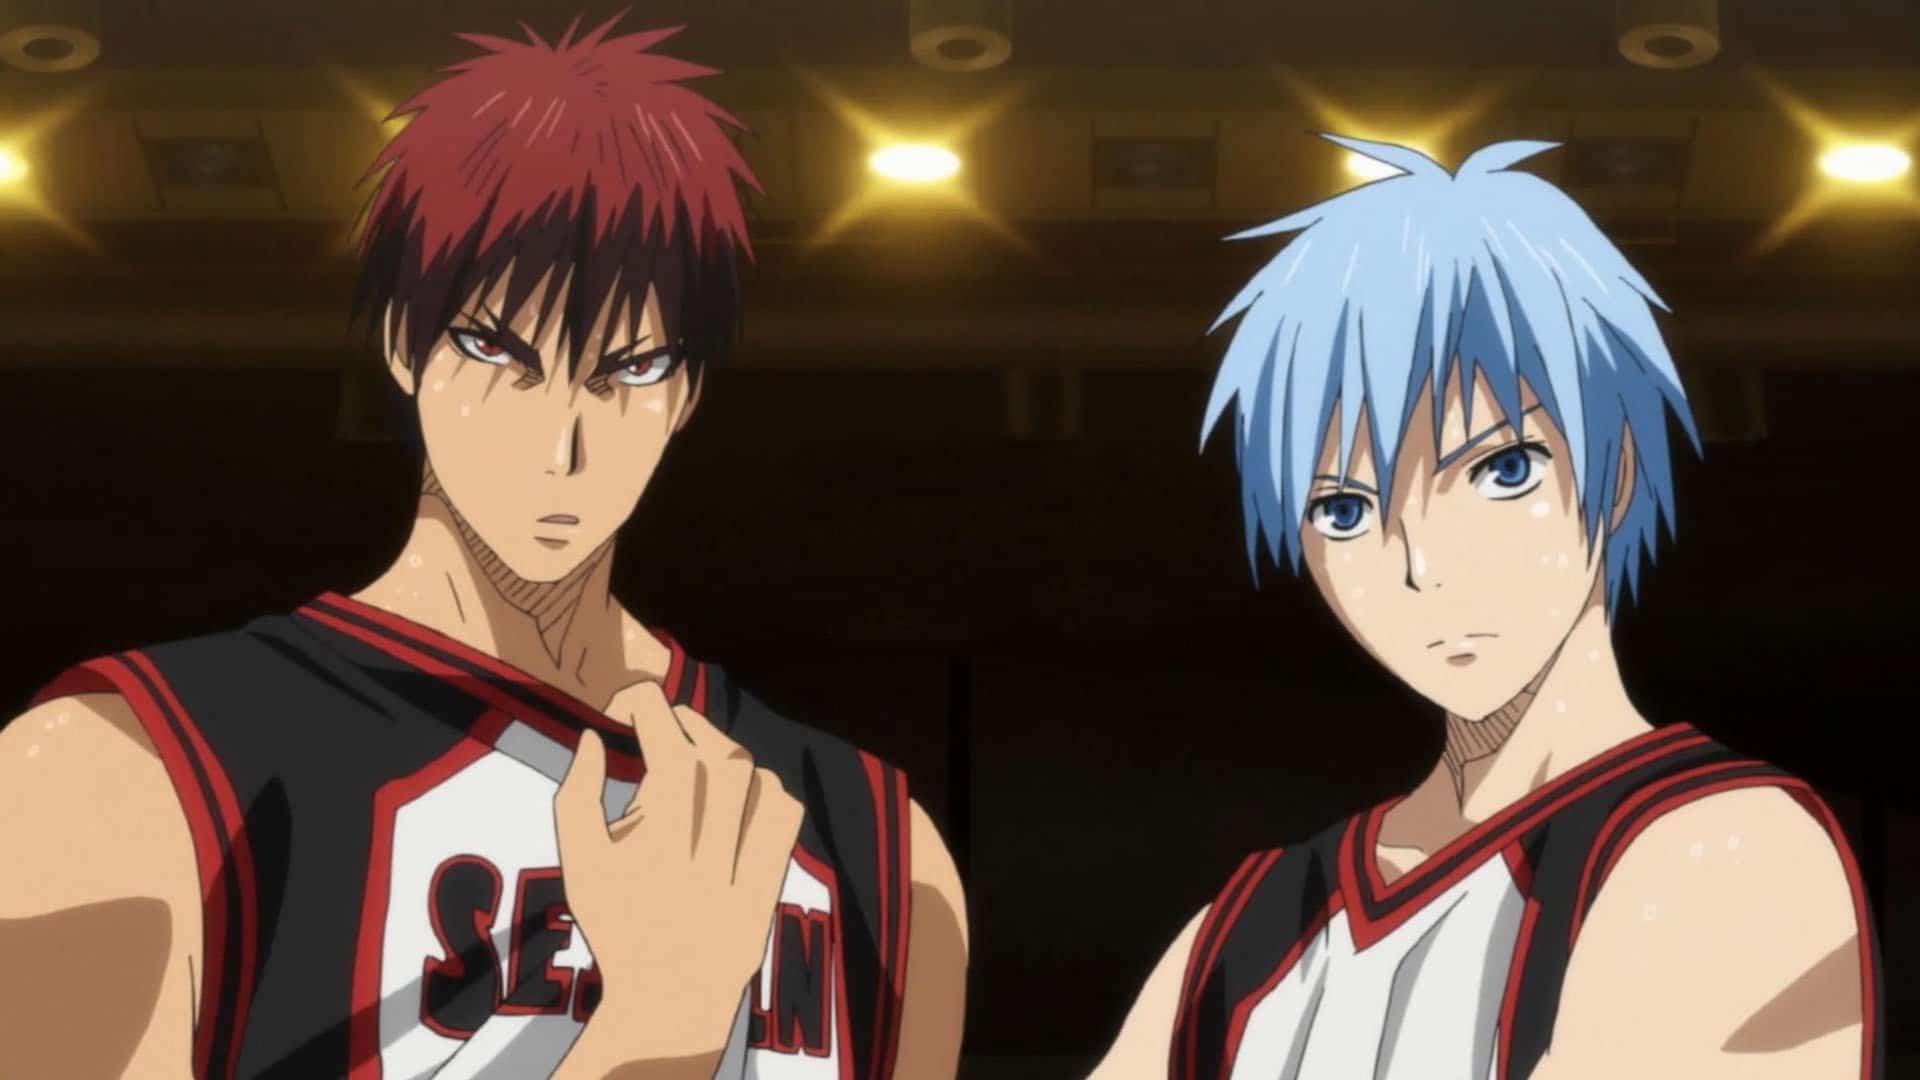 Kuroko no basket - Kagami and Kuroko • Thebiem